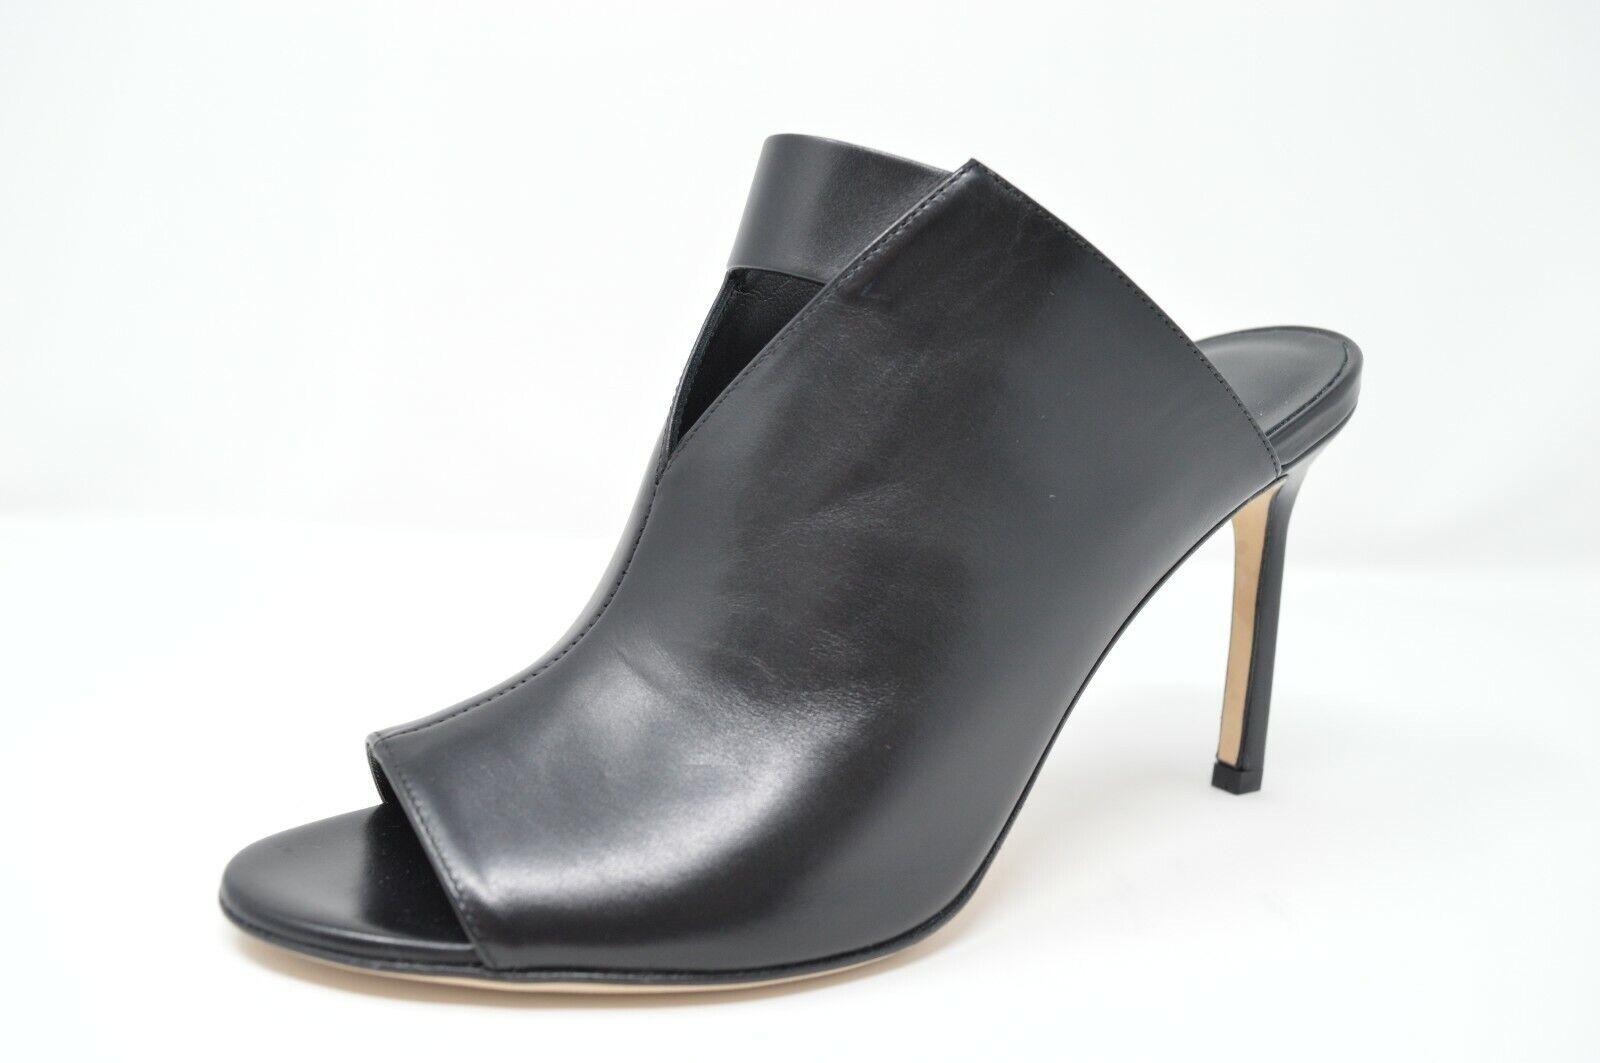 Via Spiga Mira Women's Sandals Heels Leather Peep shoes Black, Size 9 -  295